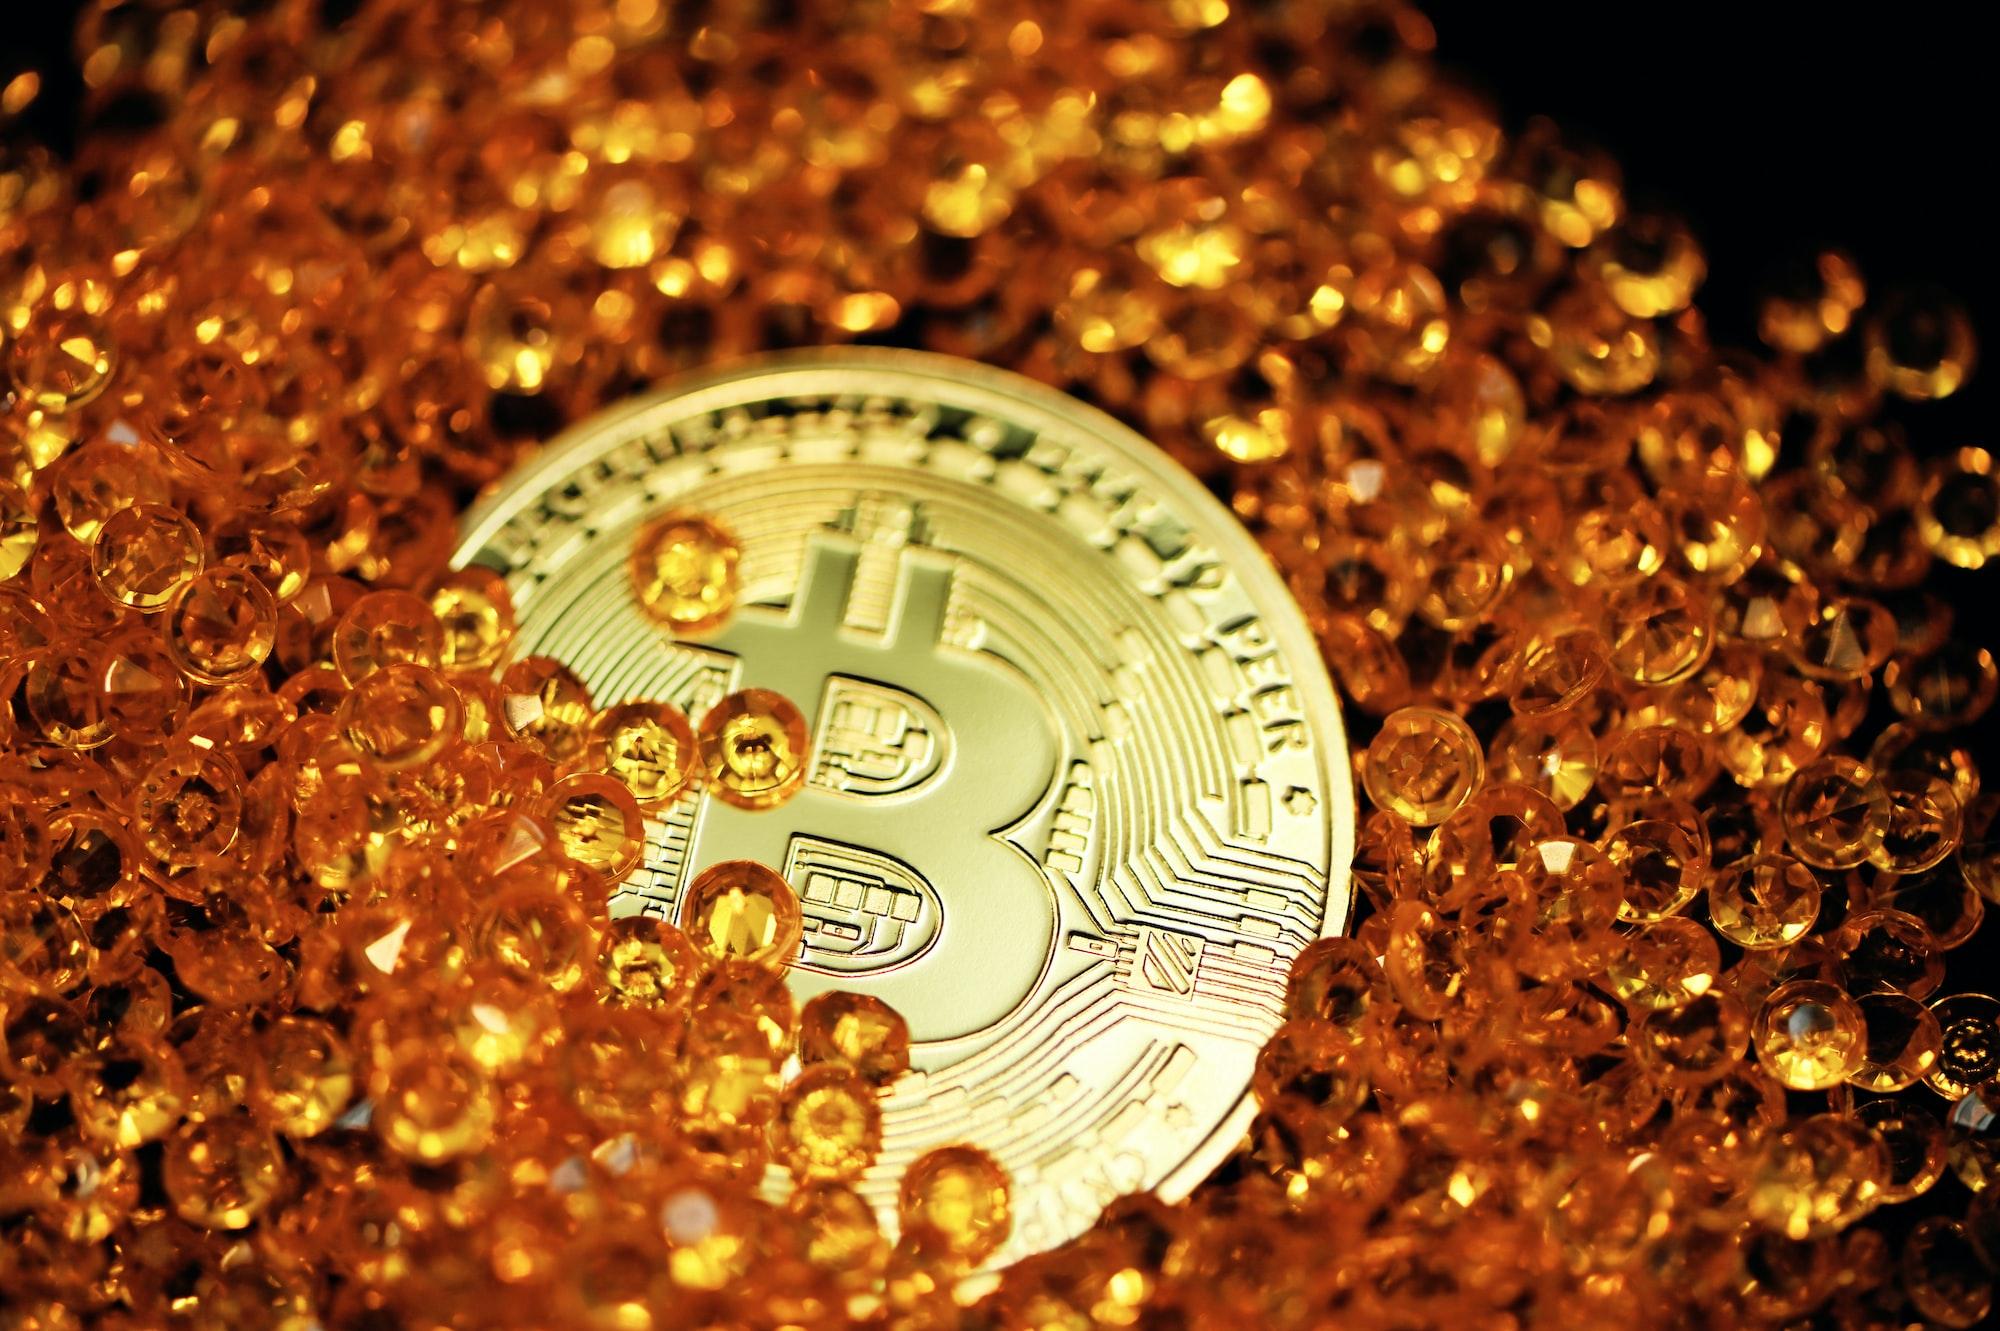 Bitcoin สูญเสียมูลค่าตลาดไปกว่า 5 แสนล้านดอลลาร์จากการปรับฐานล่าสุด